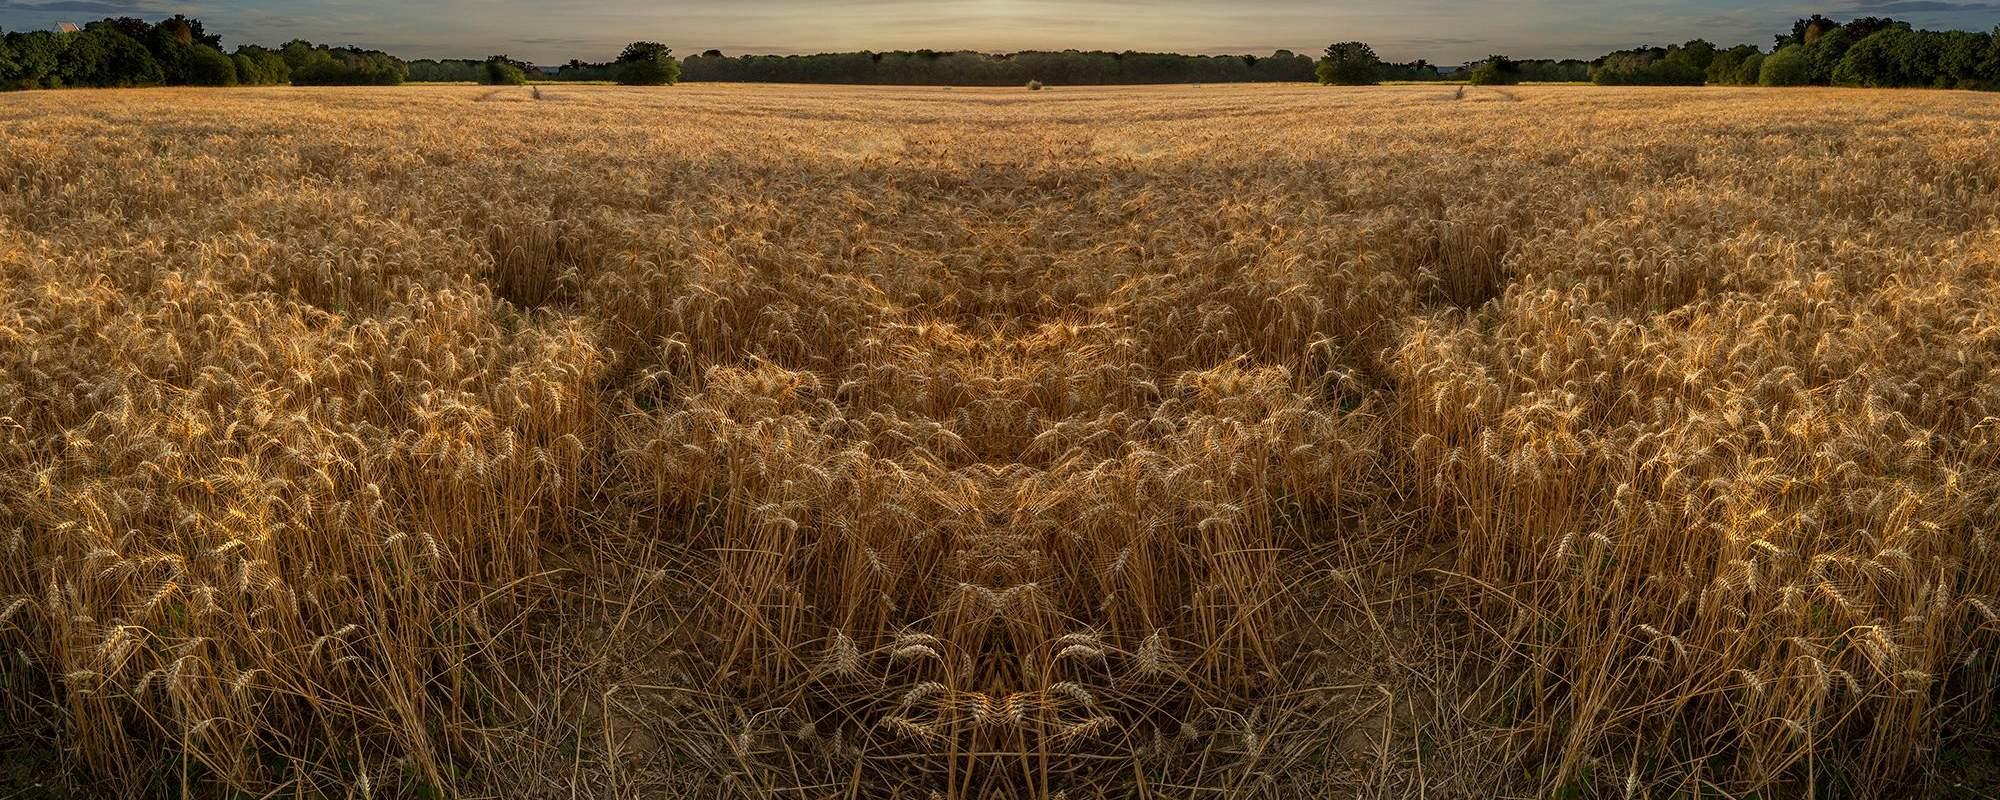 Vincentwashere Auvers Wheatfield